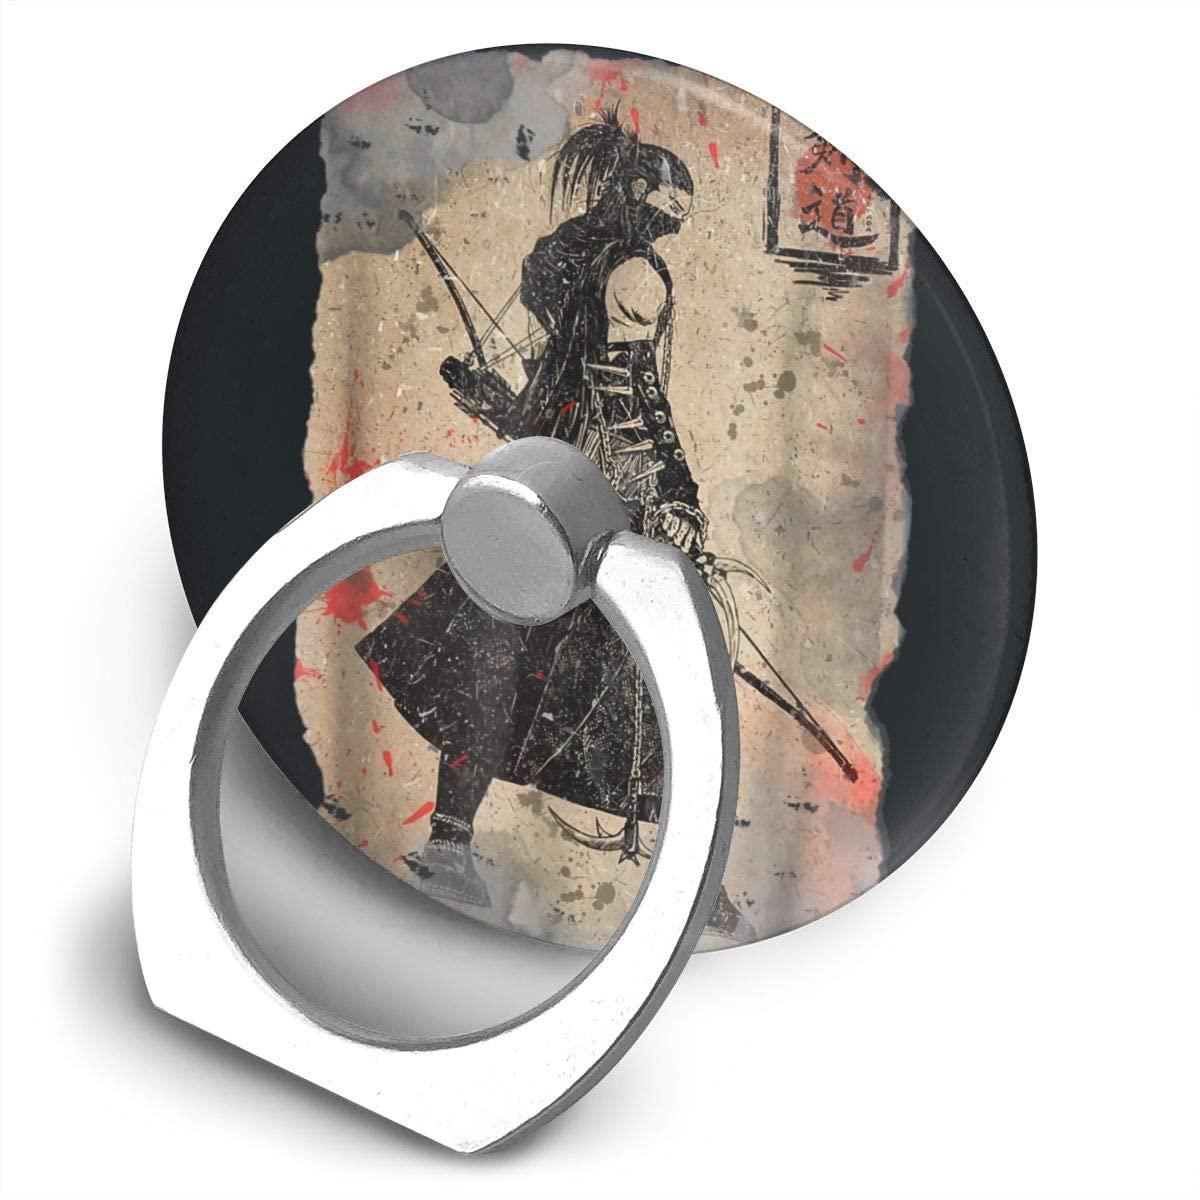 Yeorquae Samurai Sword Retro Japanese Alloy Mobile Phone Ring Bracket,360 Degree Rotating Ring Stand Grip Mounts